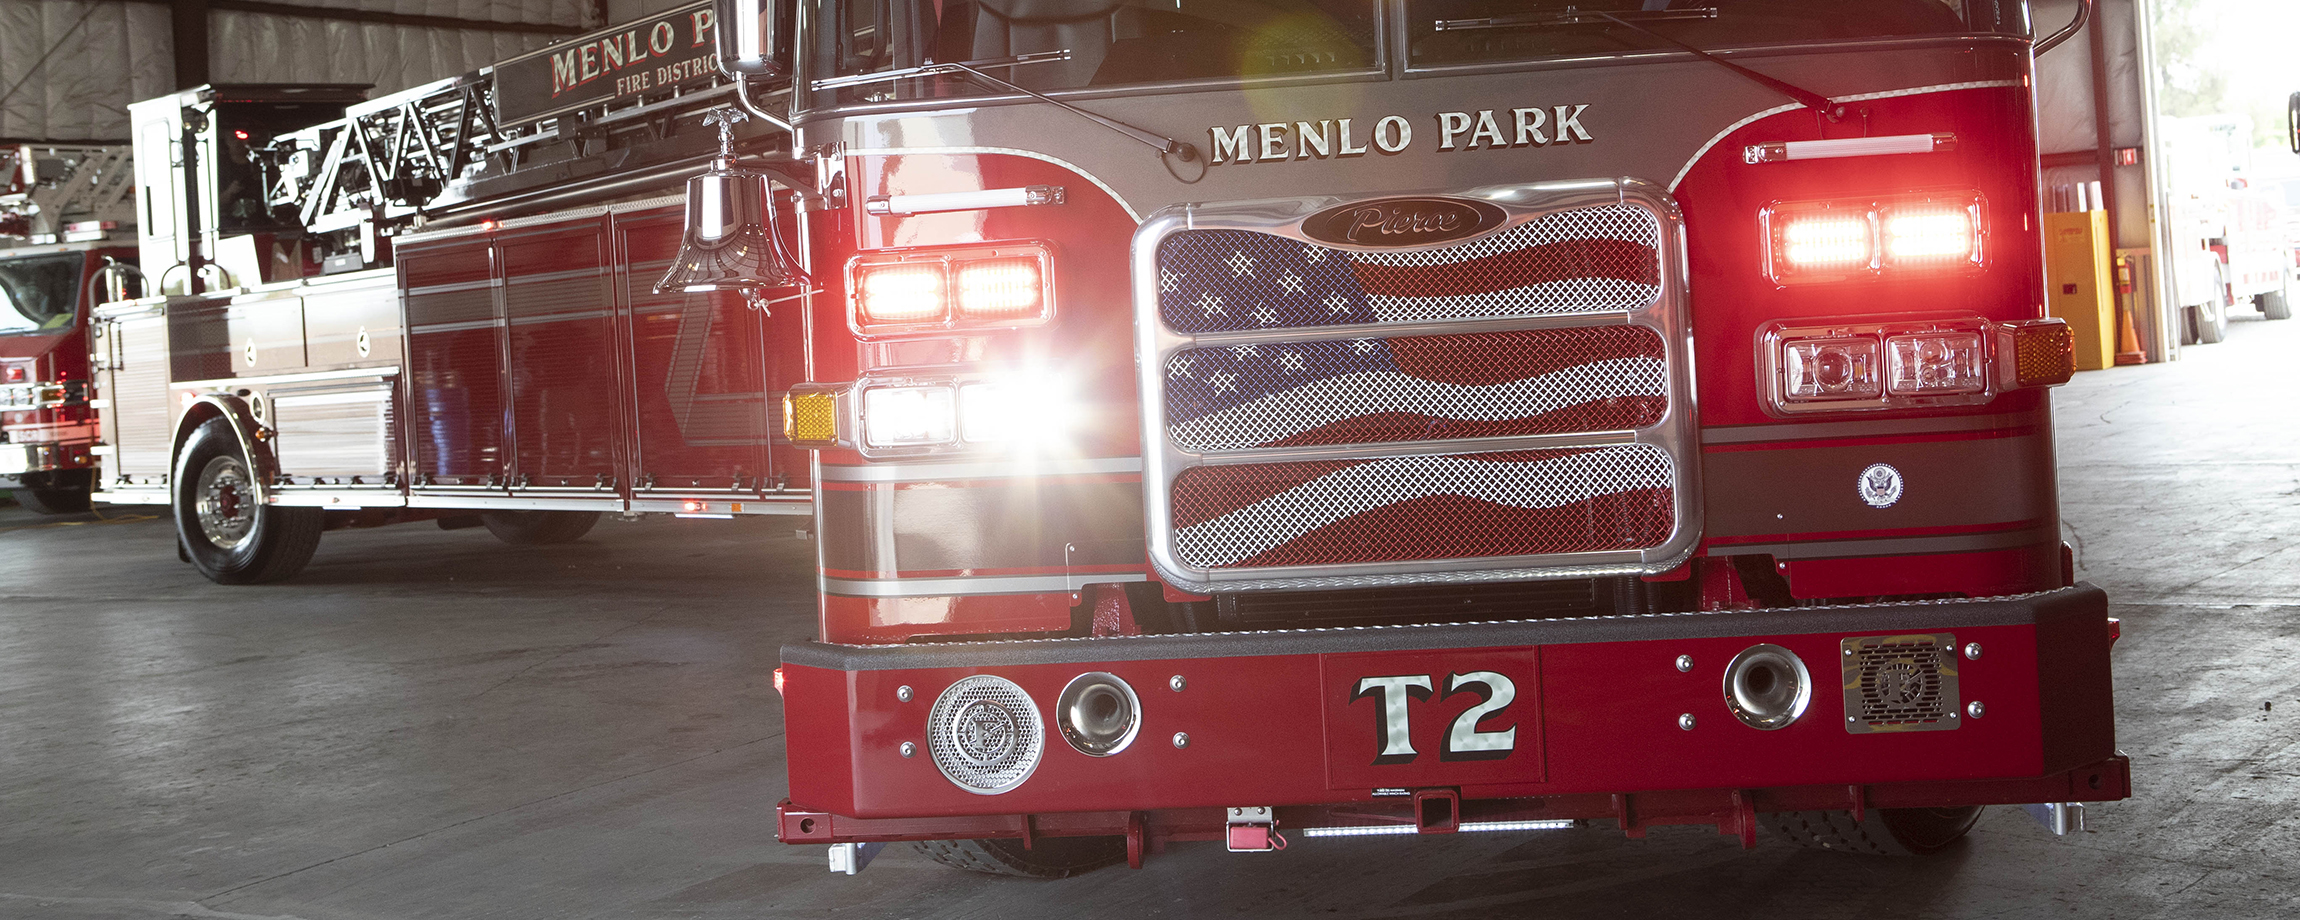 menlo-park-firetruck-banner